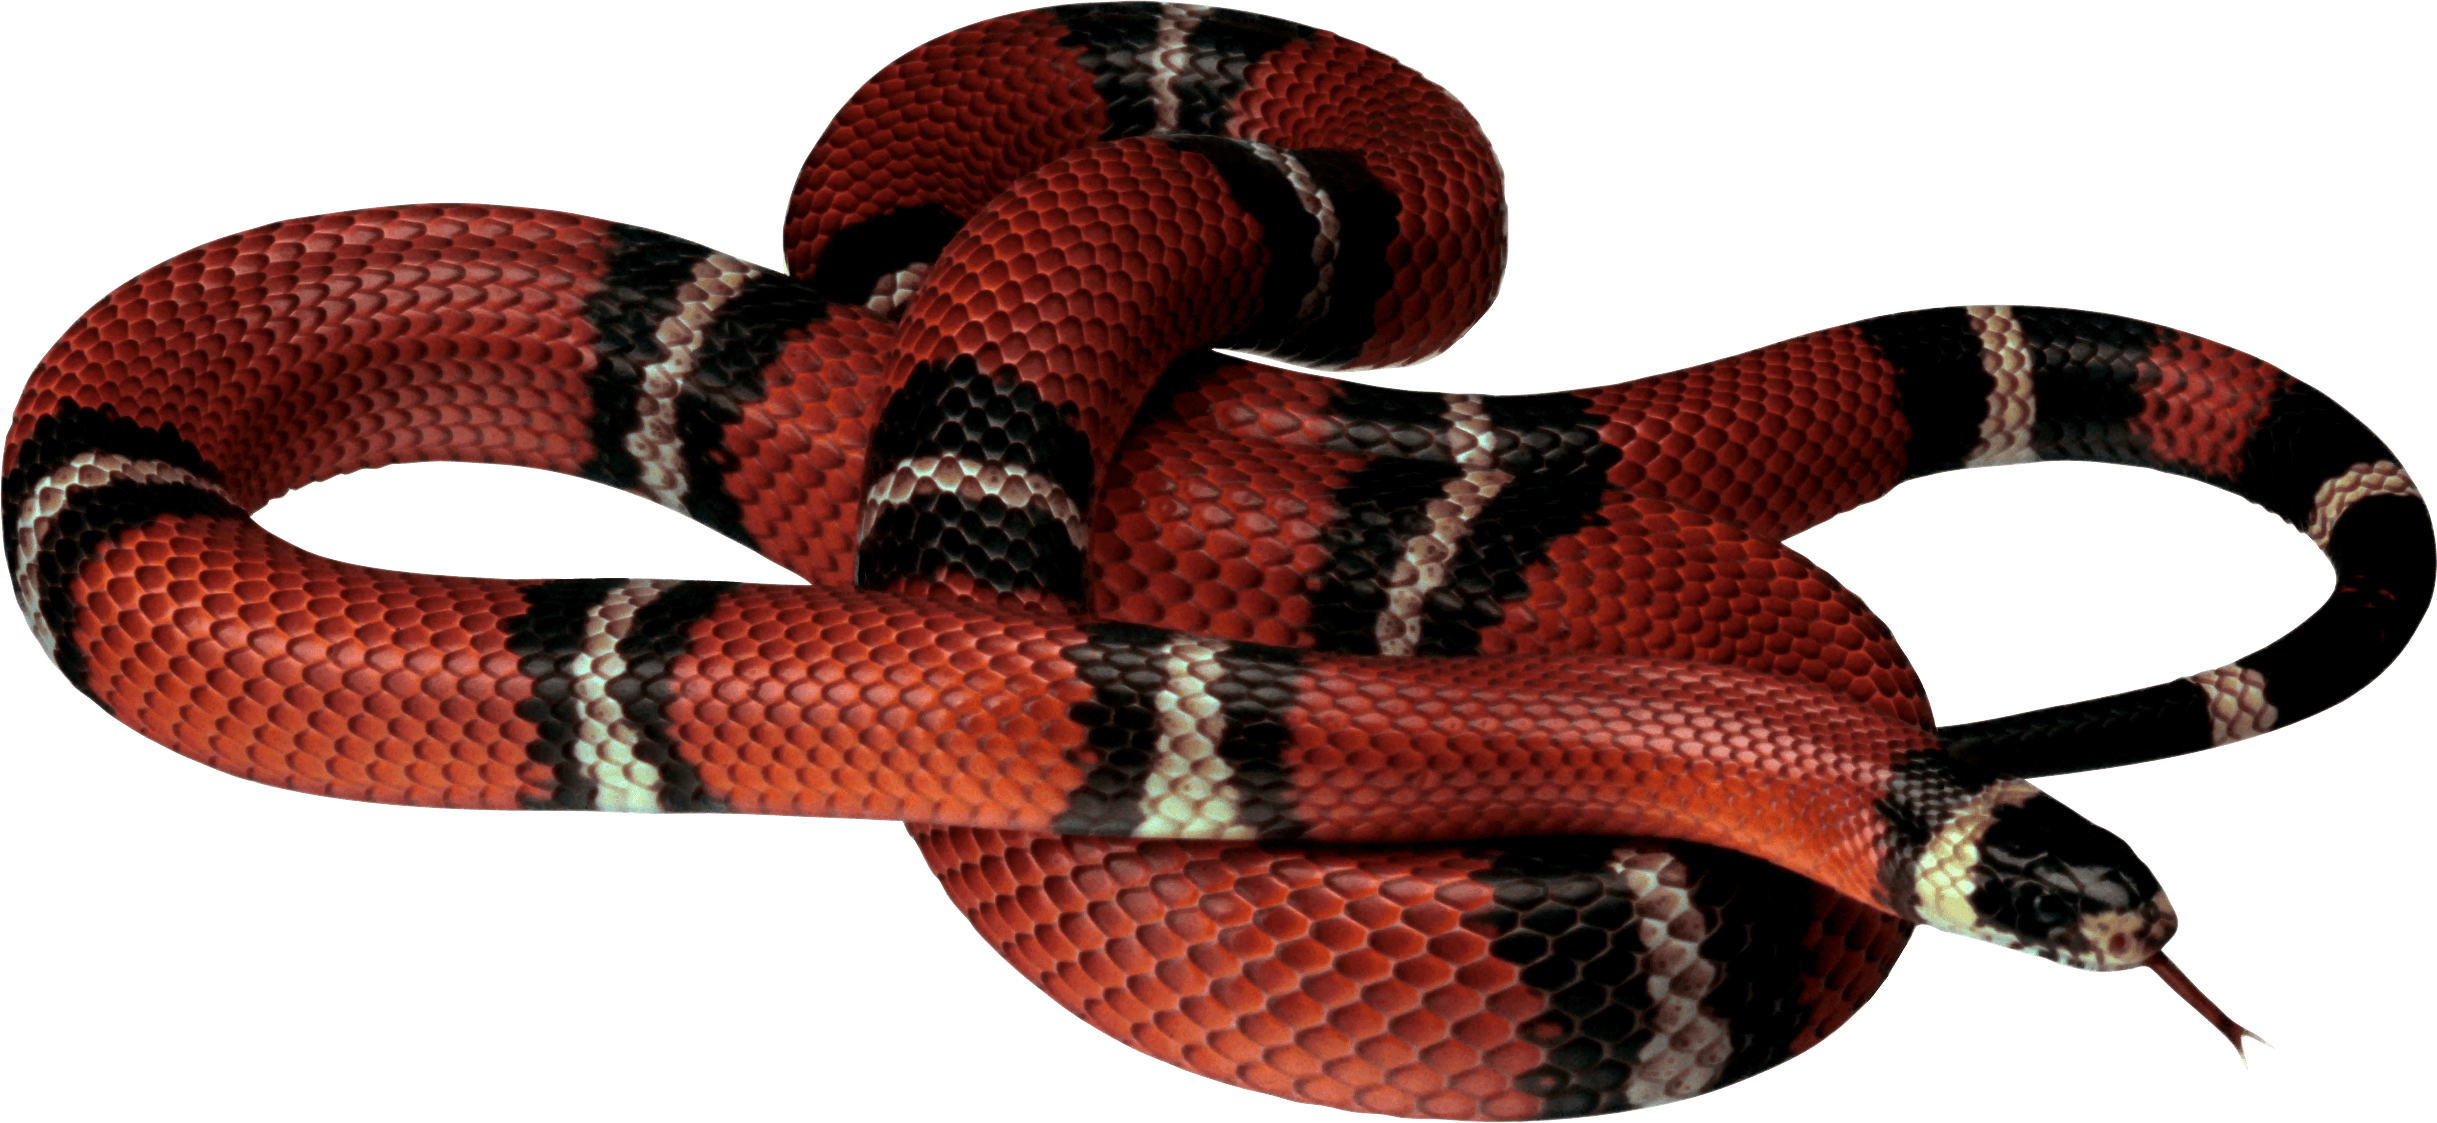 Red white black Snake PNG Image